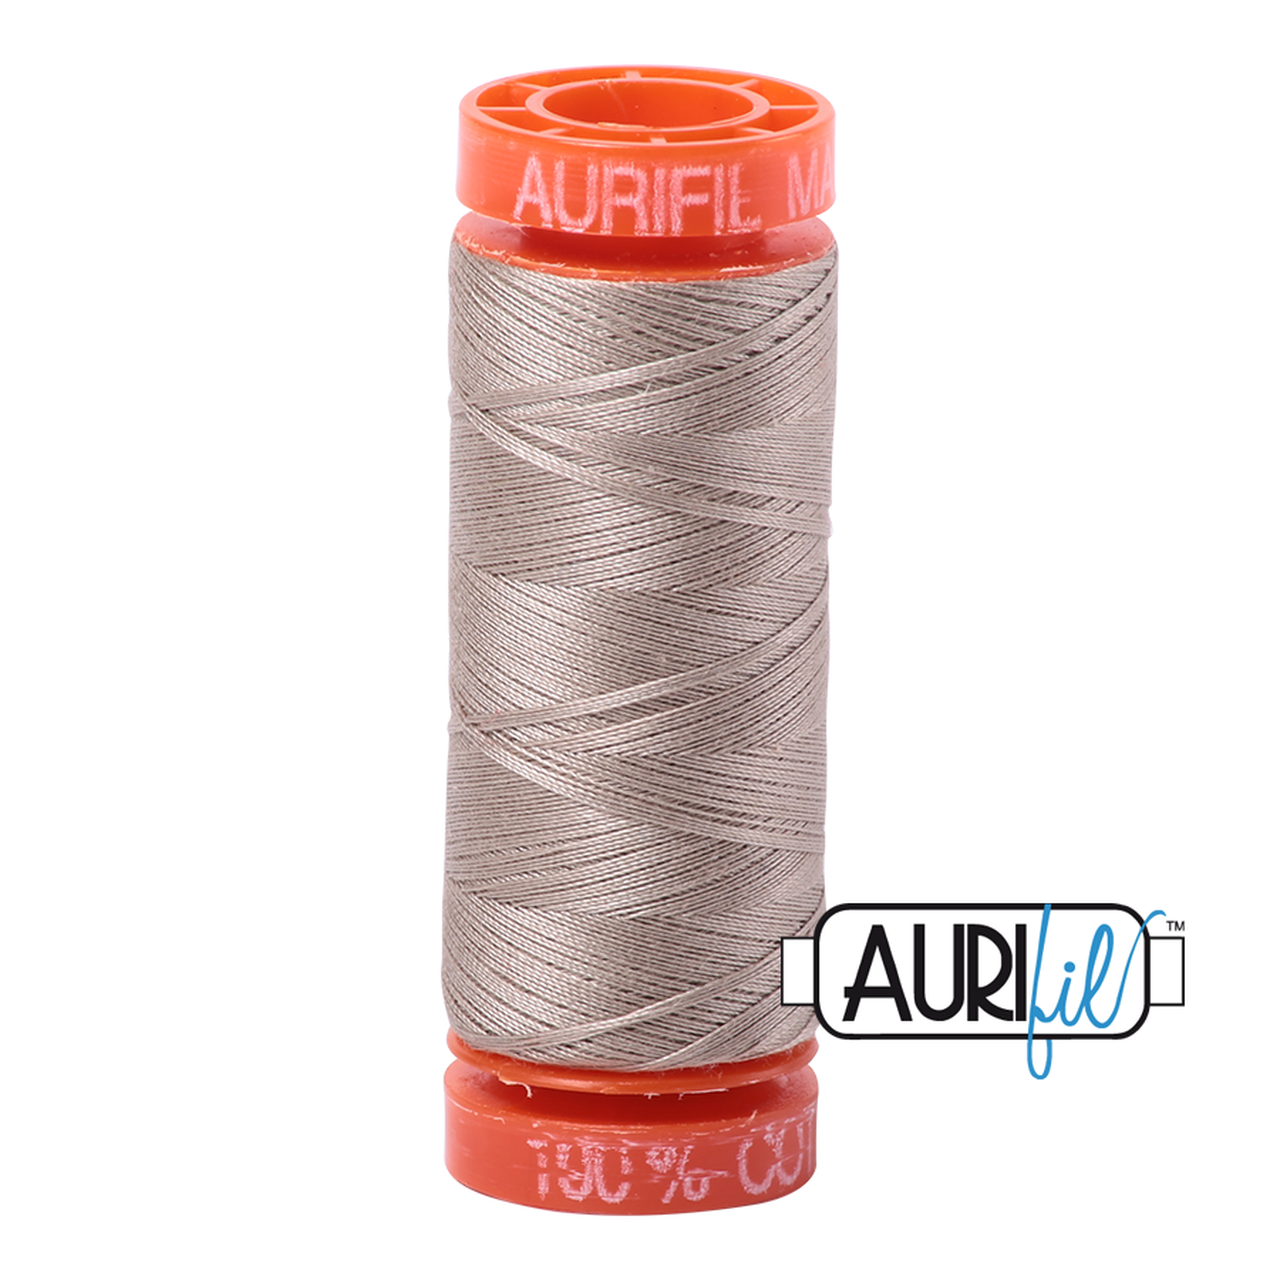 Aurifil Cotton Mako' 50 - 5011 - Rope Beige 200m